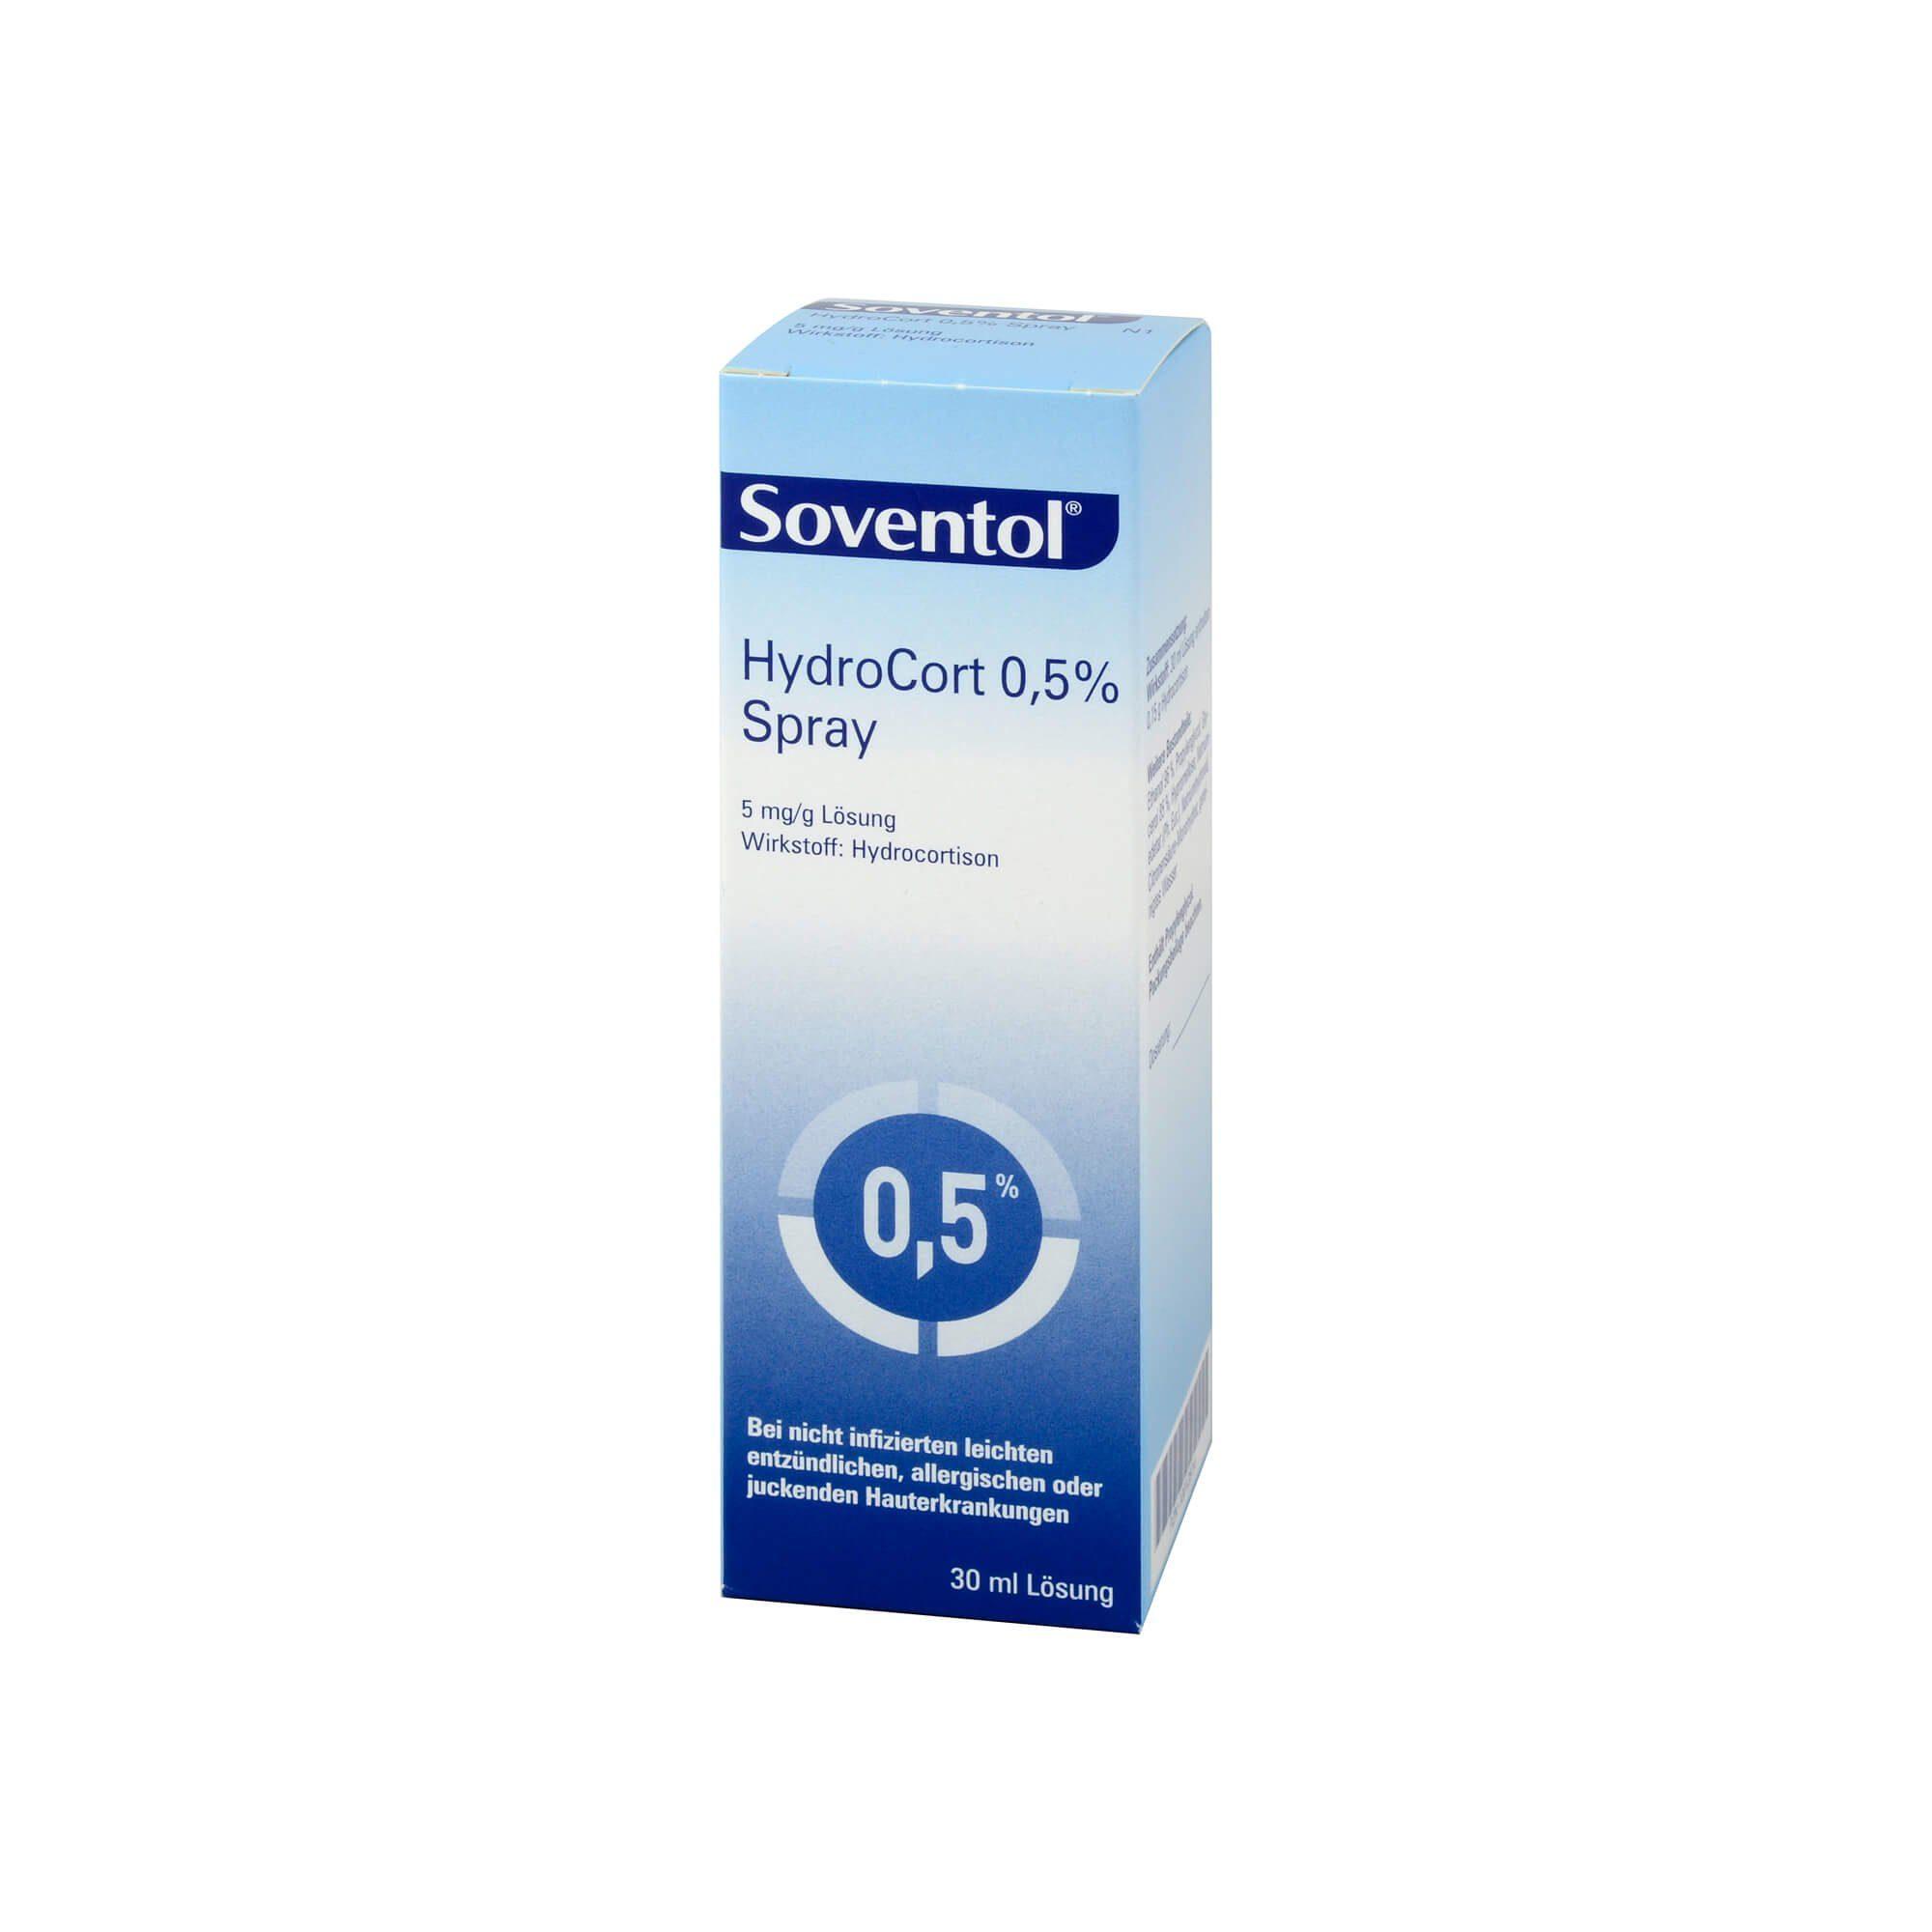 Soventol HydroCort 0,5 % Spray, 30 ml